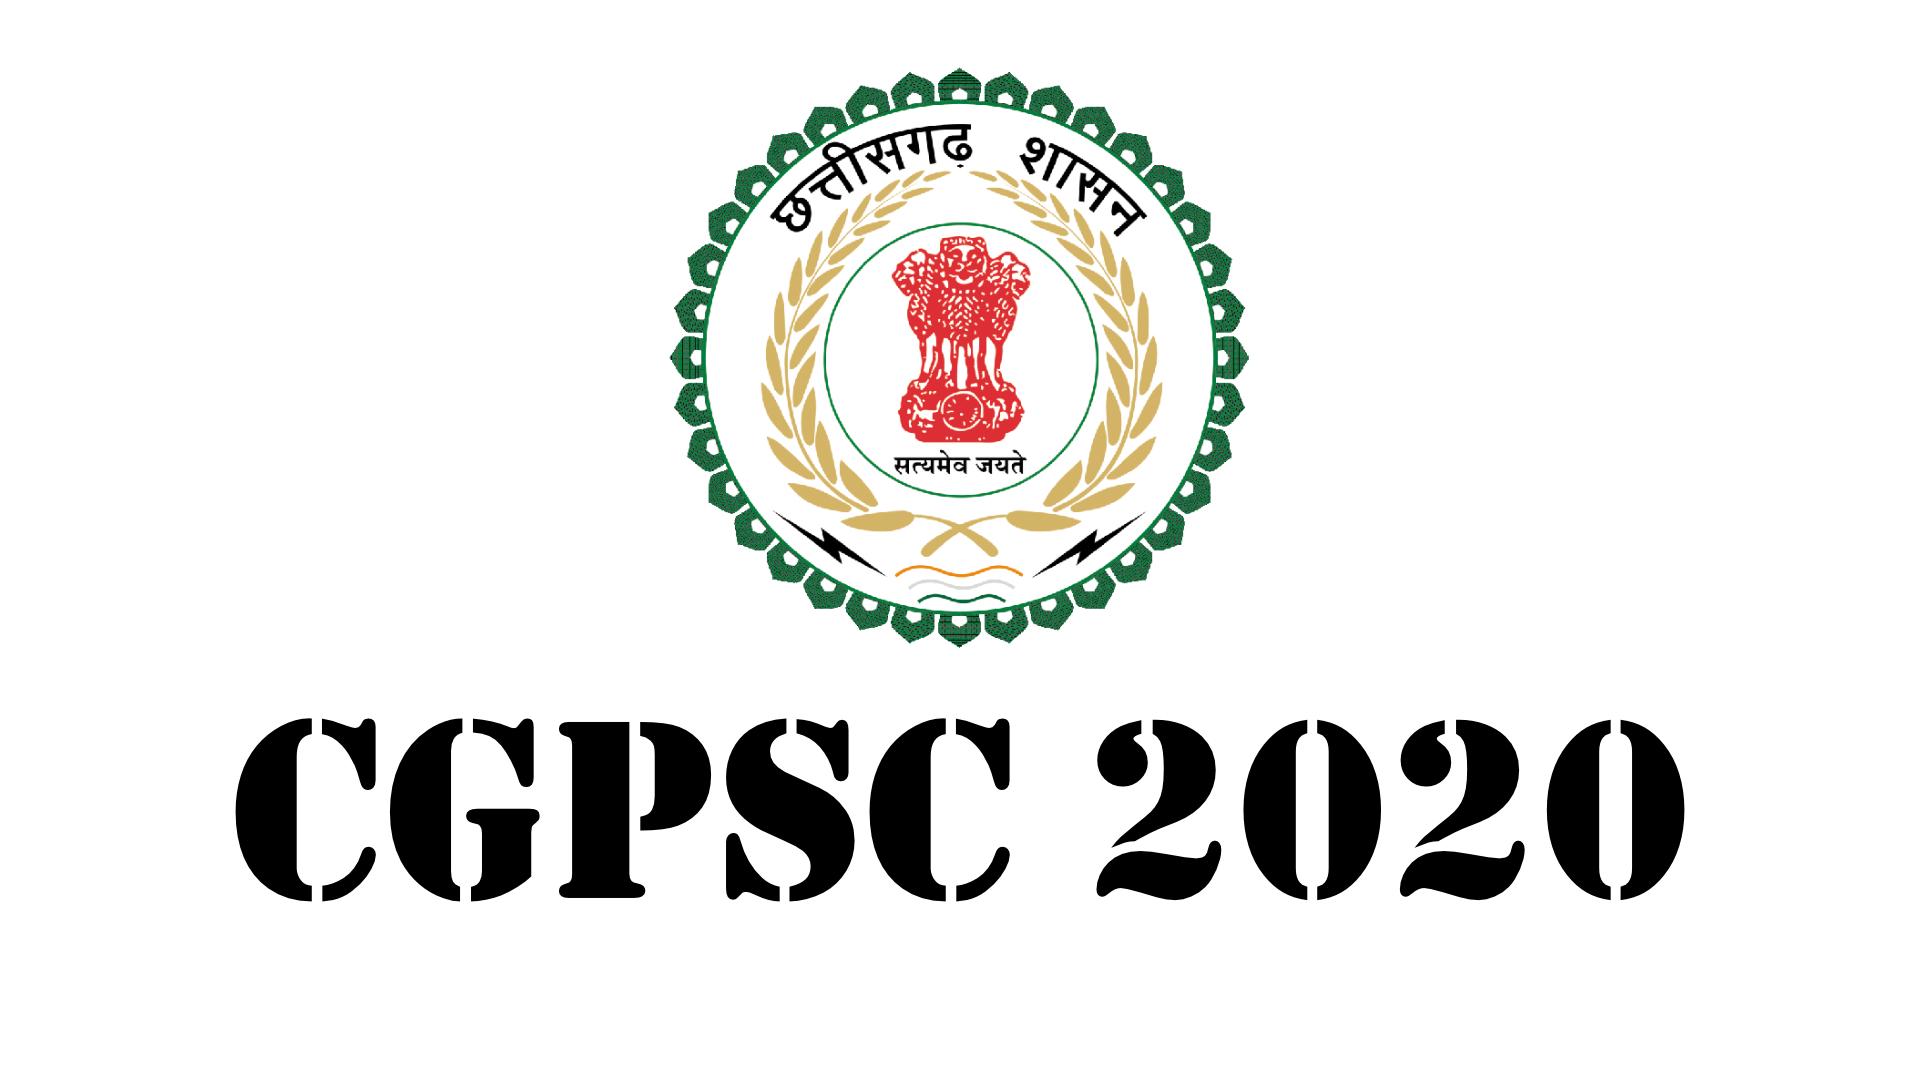 CGPSC 2020